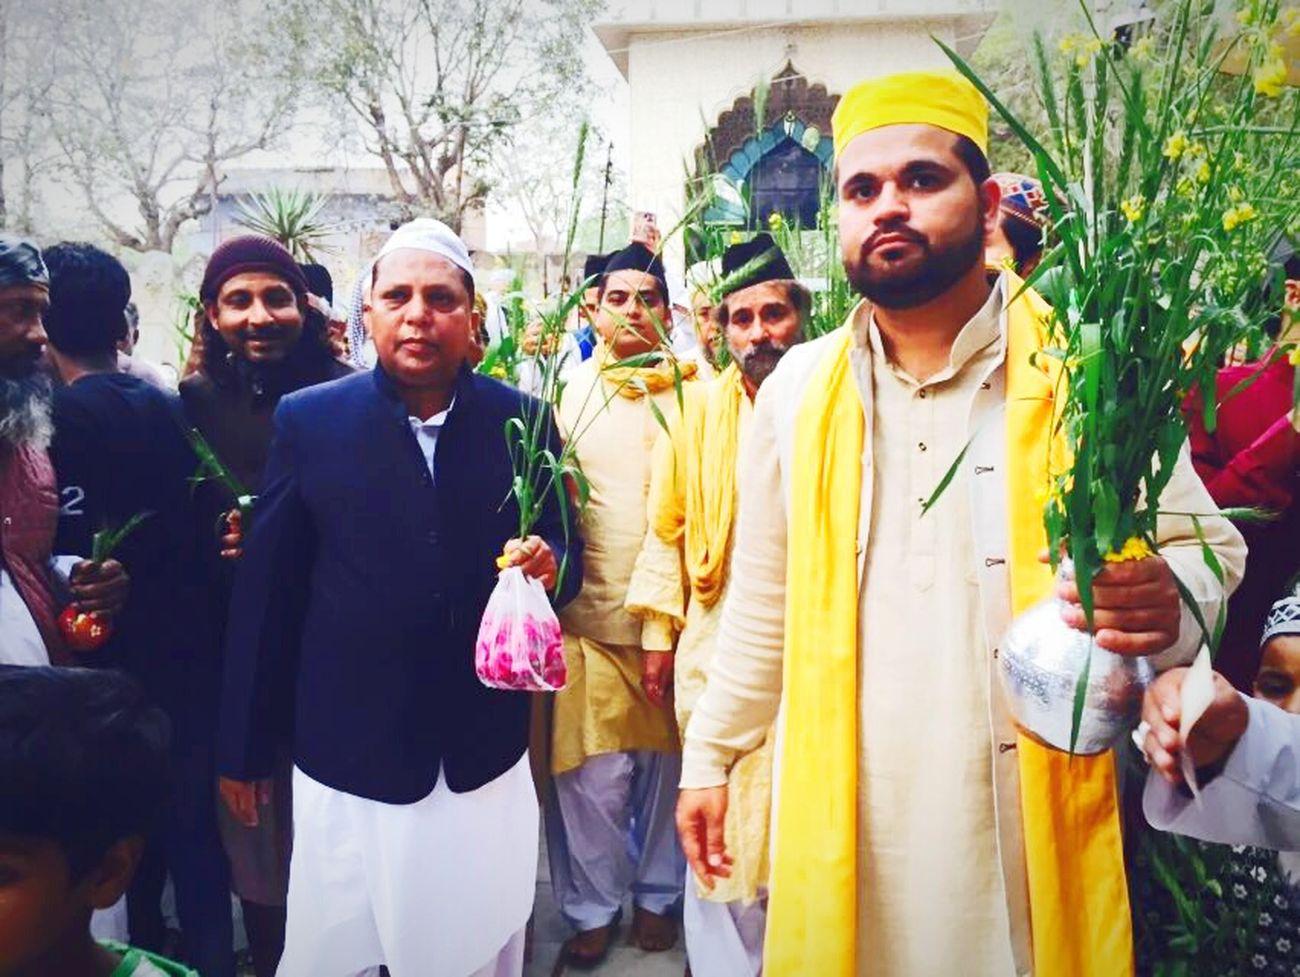 Sufism Tasavvuf Indian Shrines Dargah Ajmersharif Rajasthan Jaipur Rajasthan Trip Nizamuddindargah Ziauddin Wali